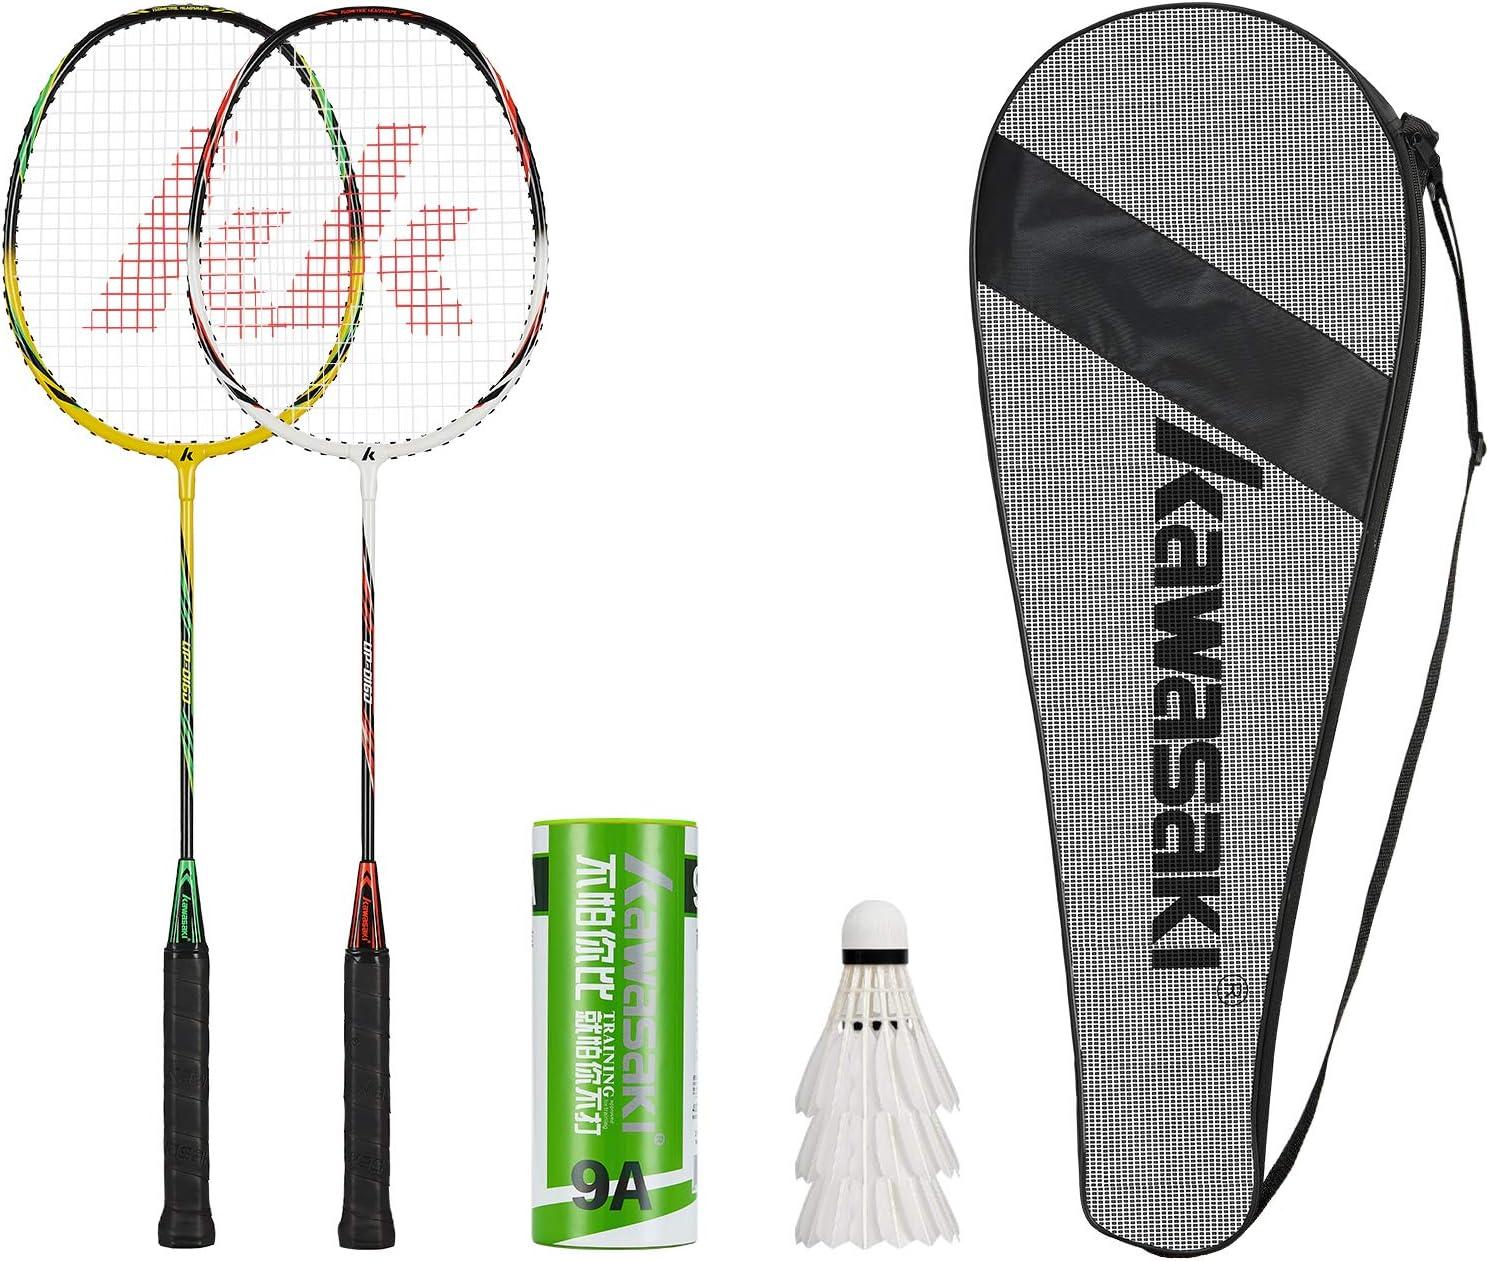 Kawasaki- 2 Player Badminton Racquets Set Rackets Double Austin Mall Aluminu Finally resale start